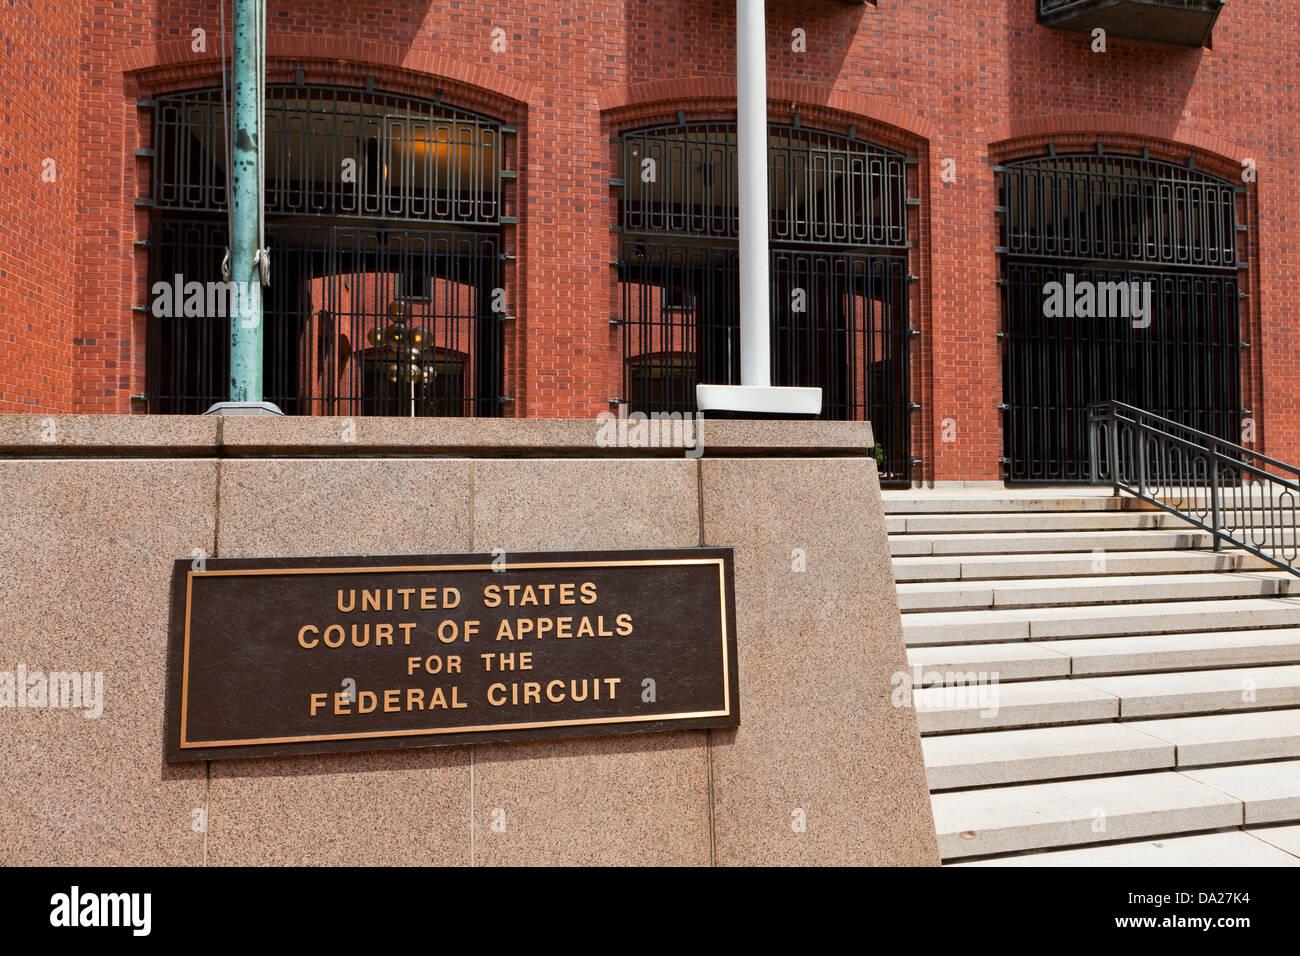 Login - United States Courts